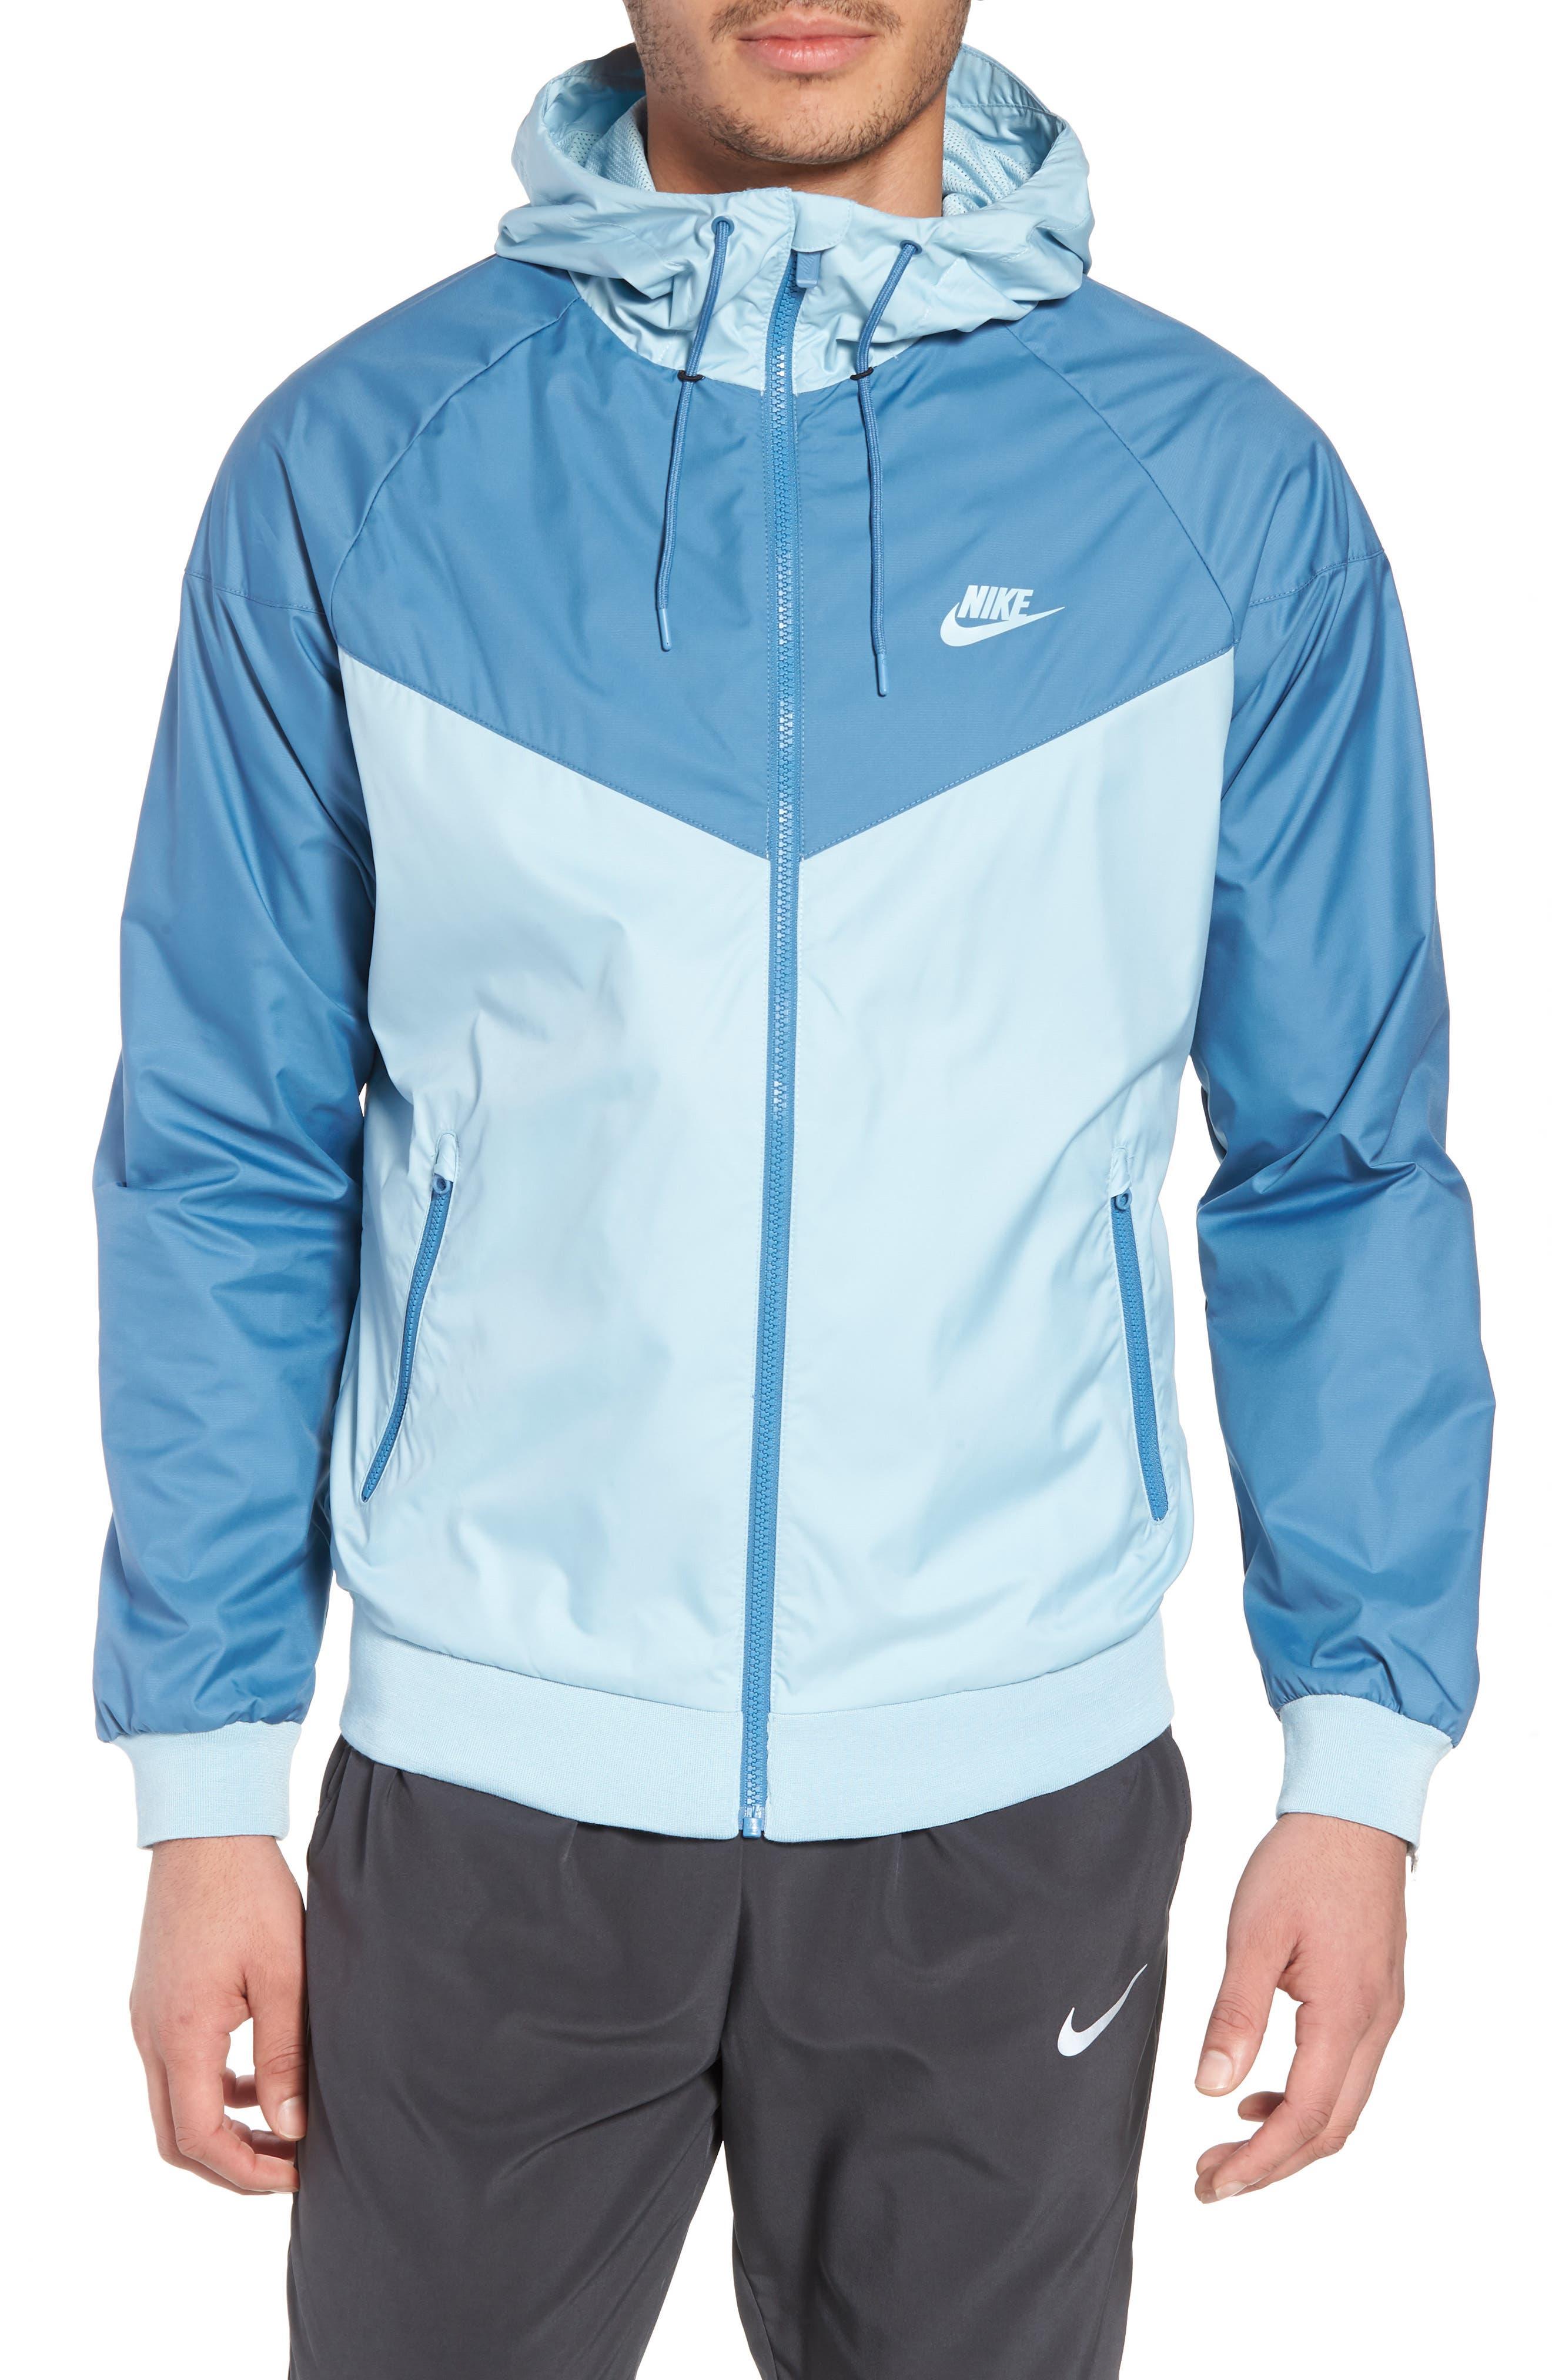 NIKE, Windrunner Colorblock Jacket, Main thumbnail 1, color, OCEAN BLISS/ AEGEAN STORM